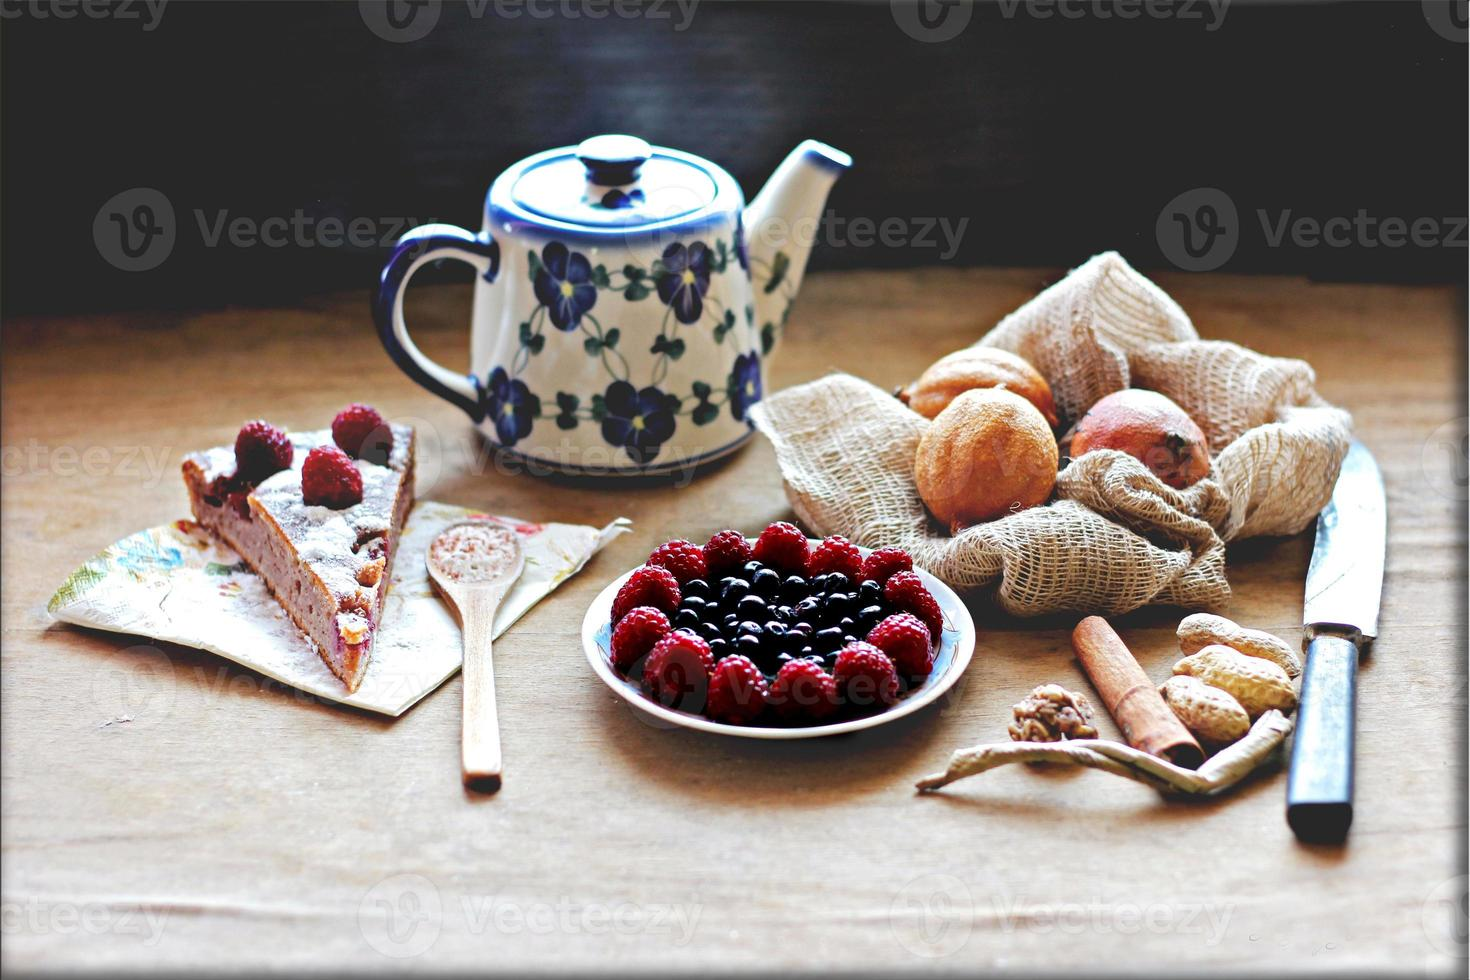 la tarta de frambuesa foto